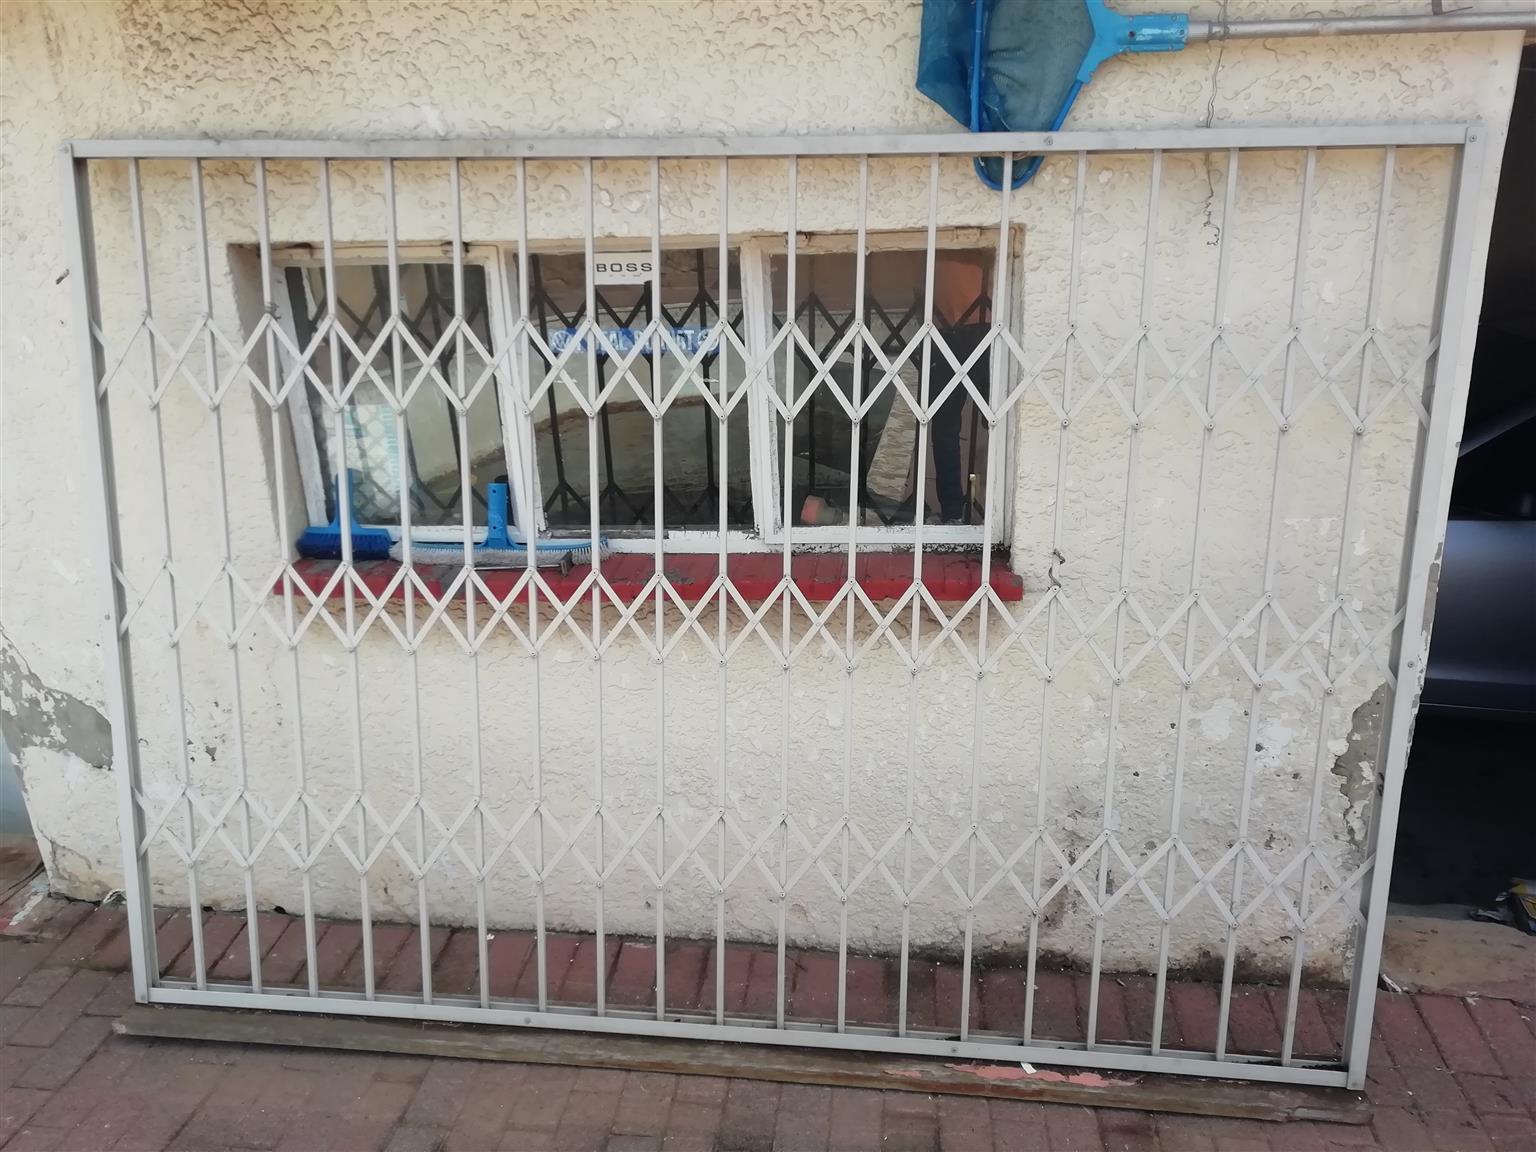 Maxidor security barrier